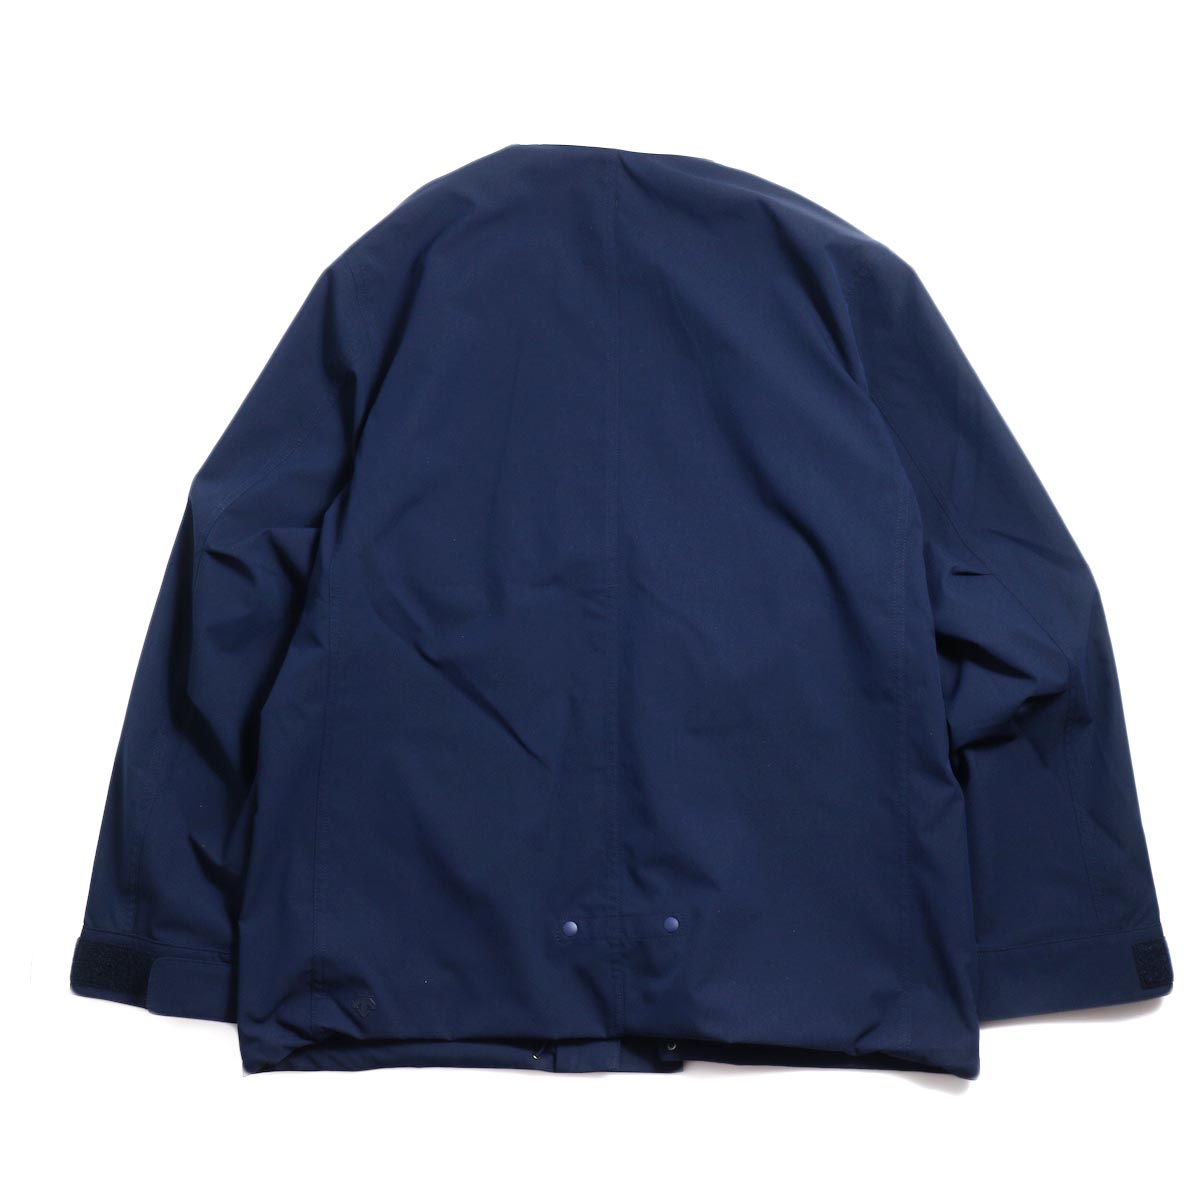 DESCENTE ddd / Utility Jacket -Navy 背面